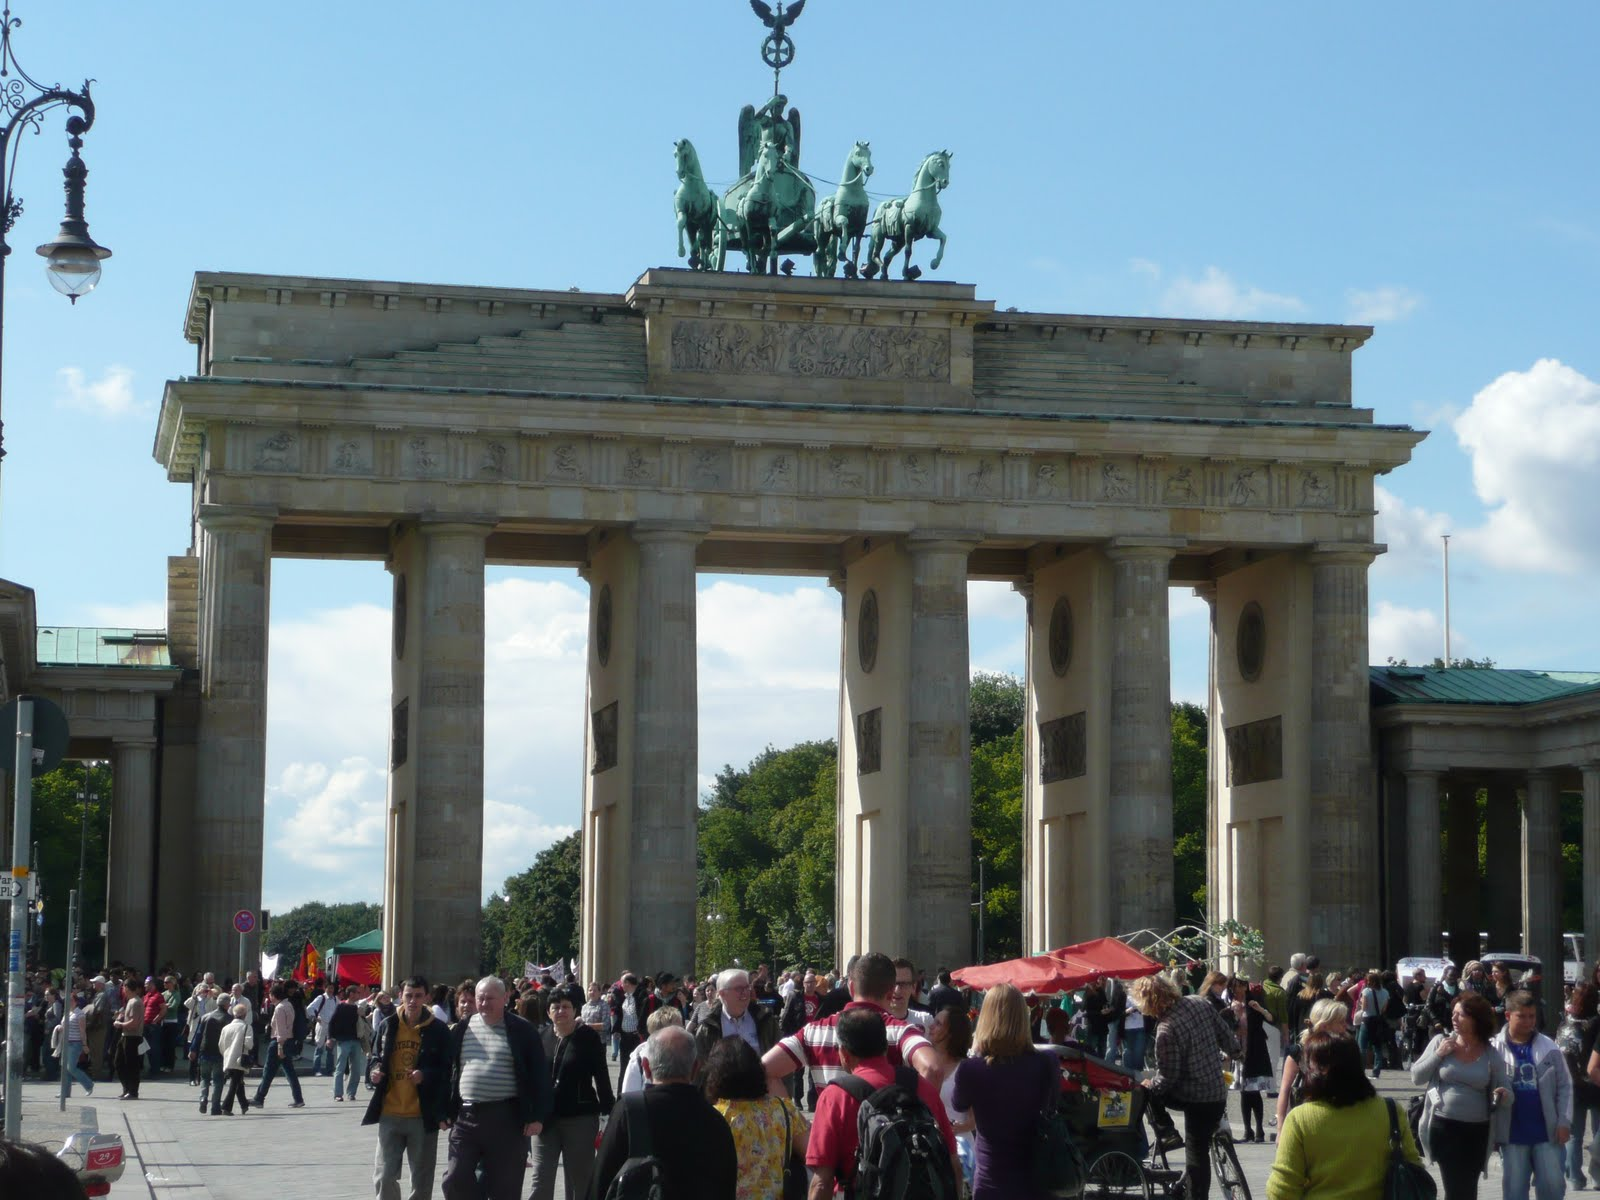 Picture: Berlin Brandenburger Tor